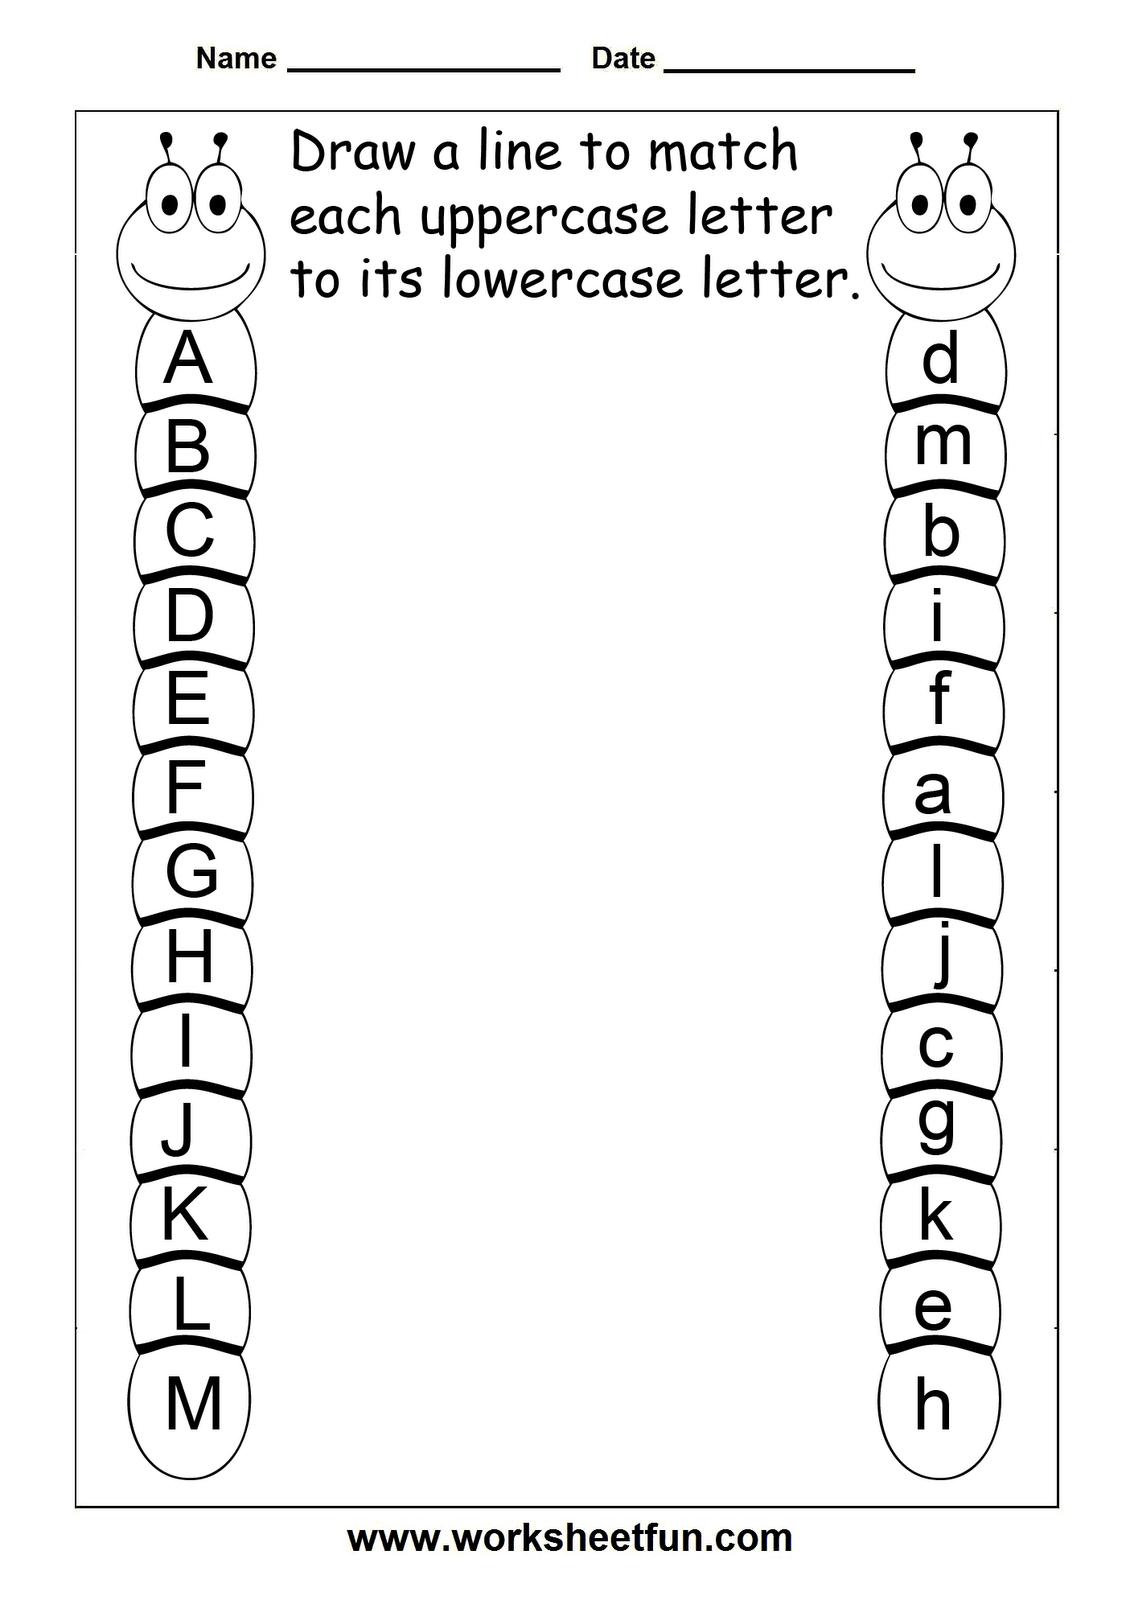 Free Printable Worksheets**** Pre - K - 4Th | Checco | Preschool - Free Printable Pre K Worksheets